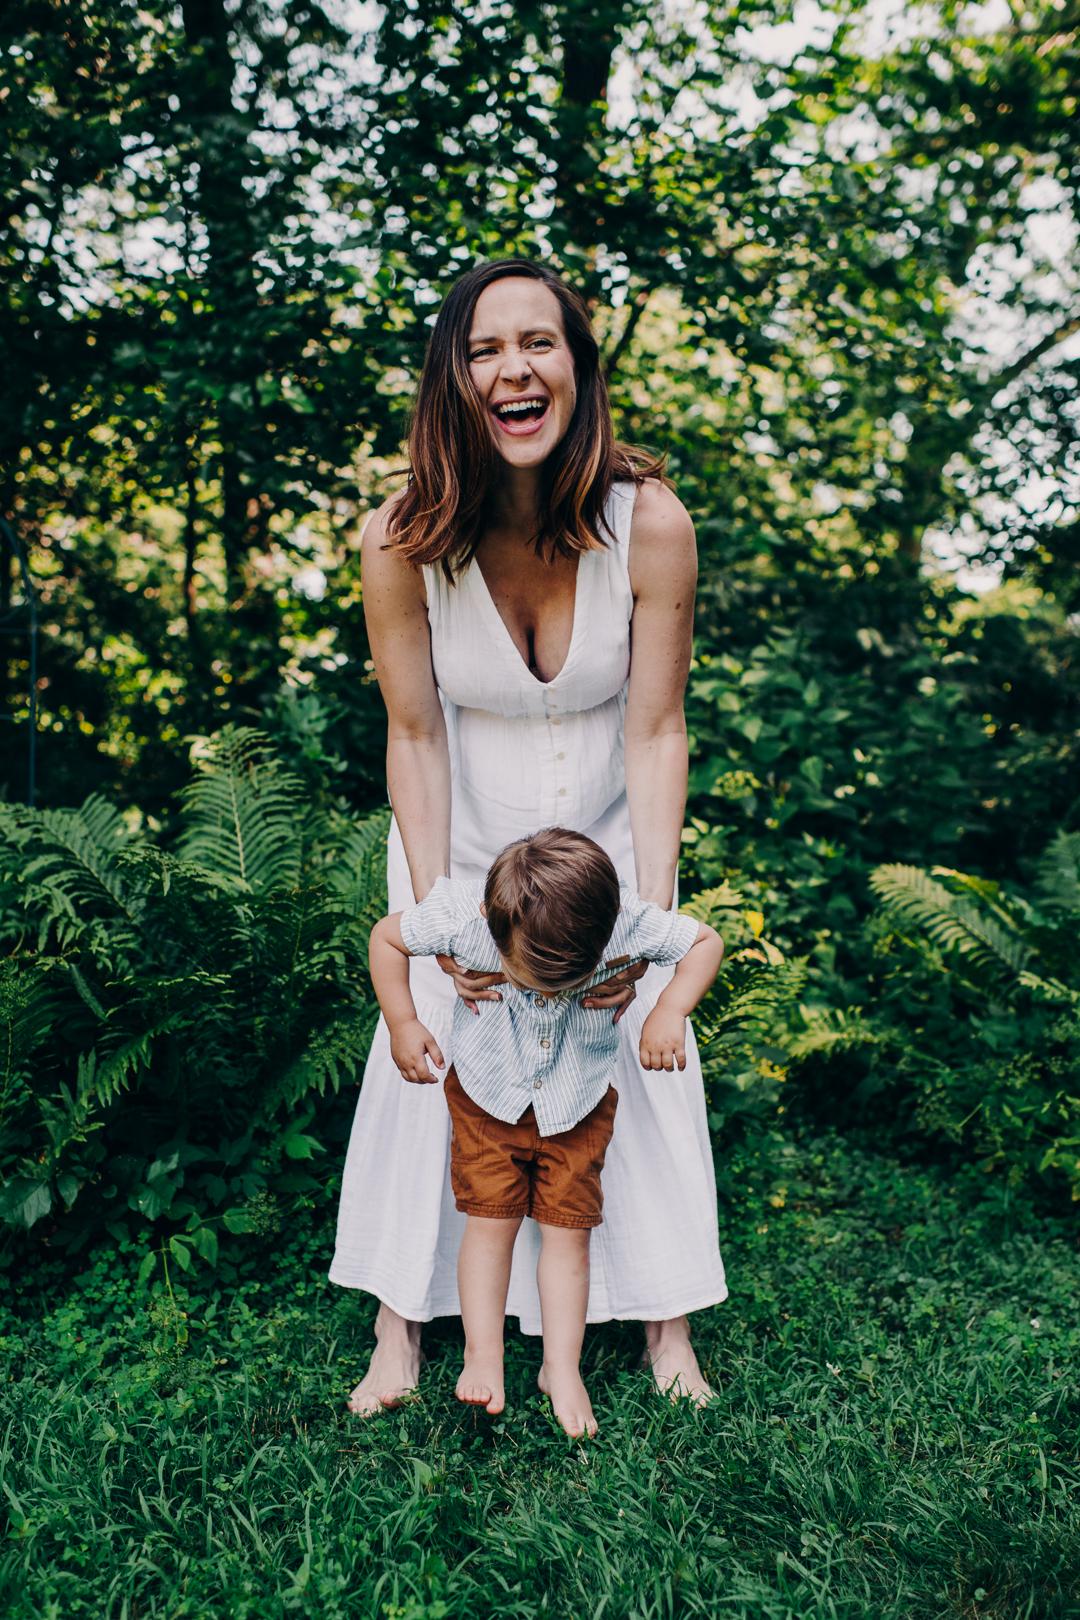 TerraSuraPhotography-Sloane Vasseur Family Newborn-Web-5250.jpg